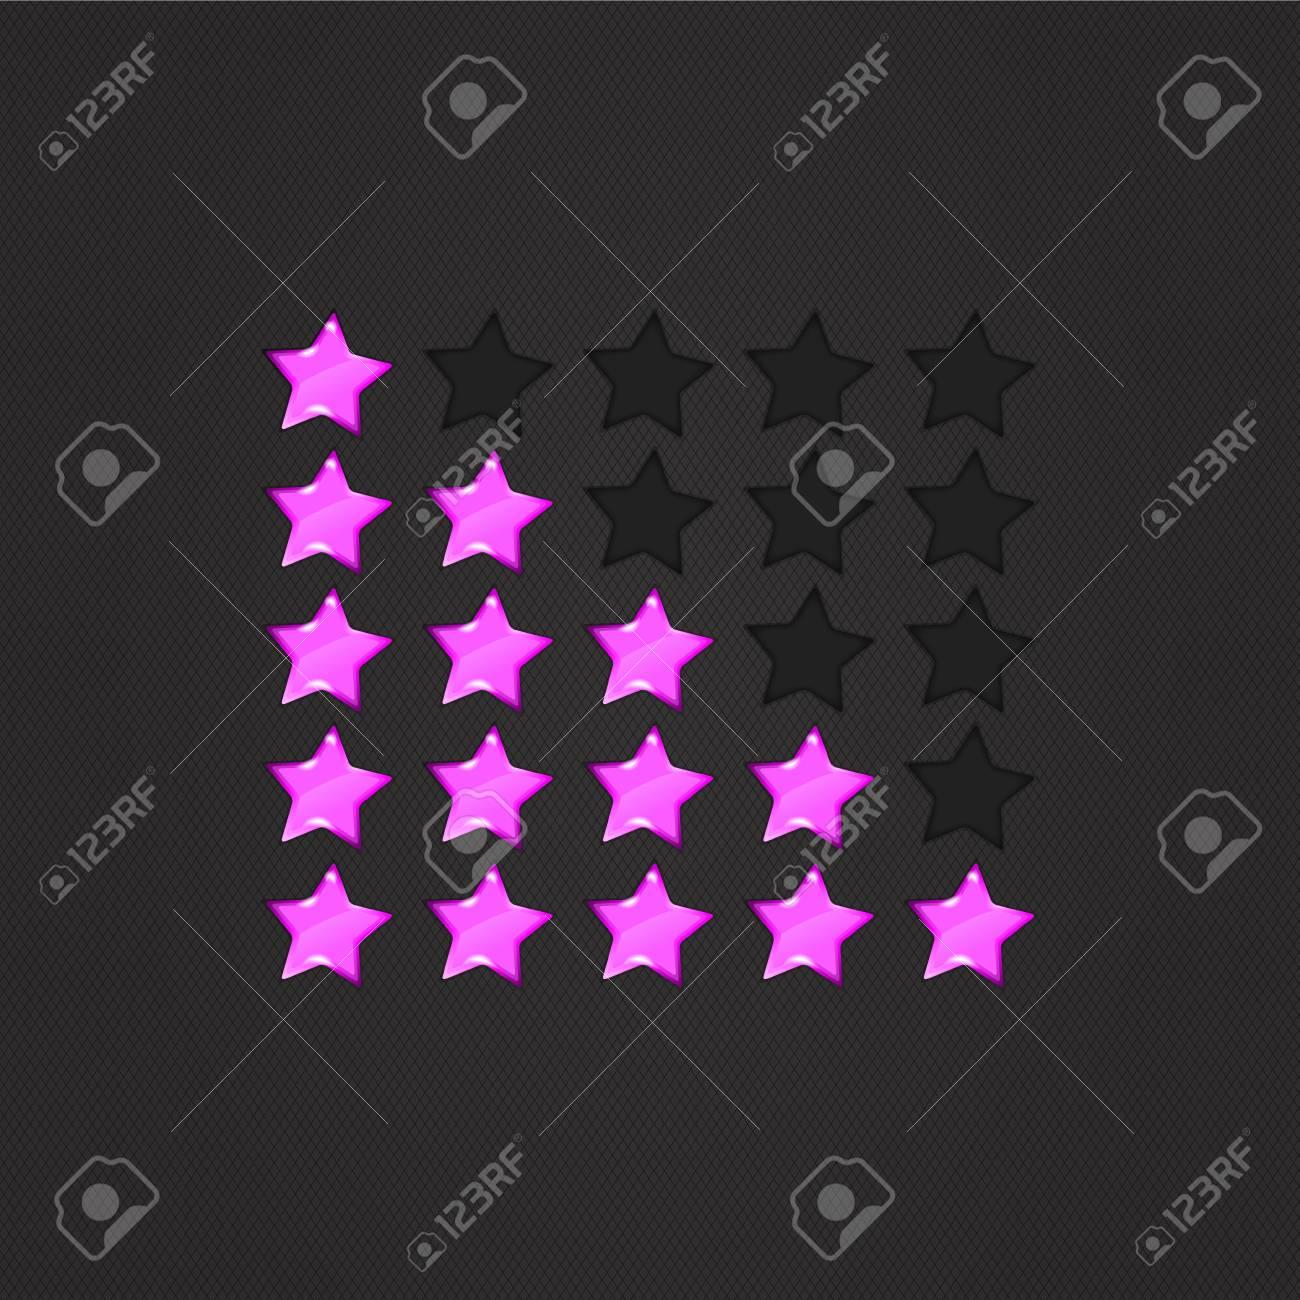 Glossy Rating Stars violet for web. vector illustration, eps10 Stock Vector - 14792268